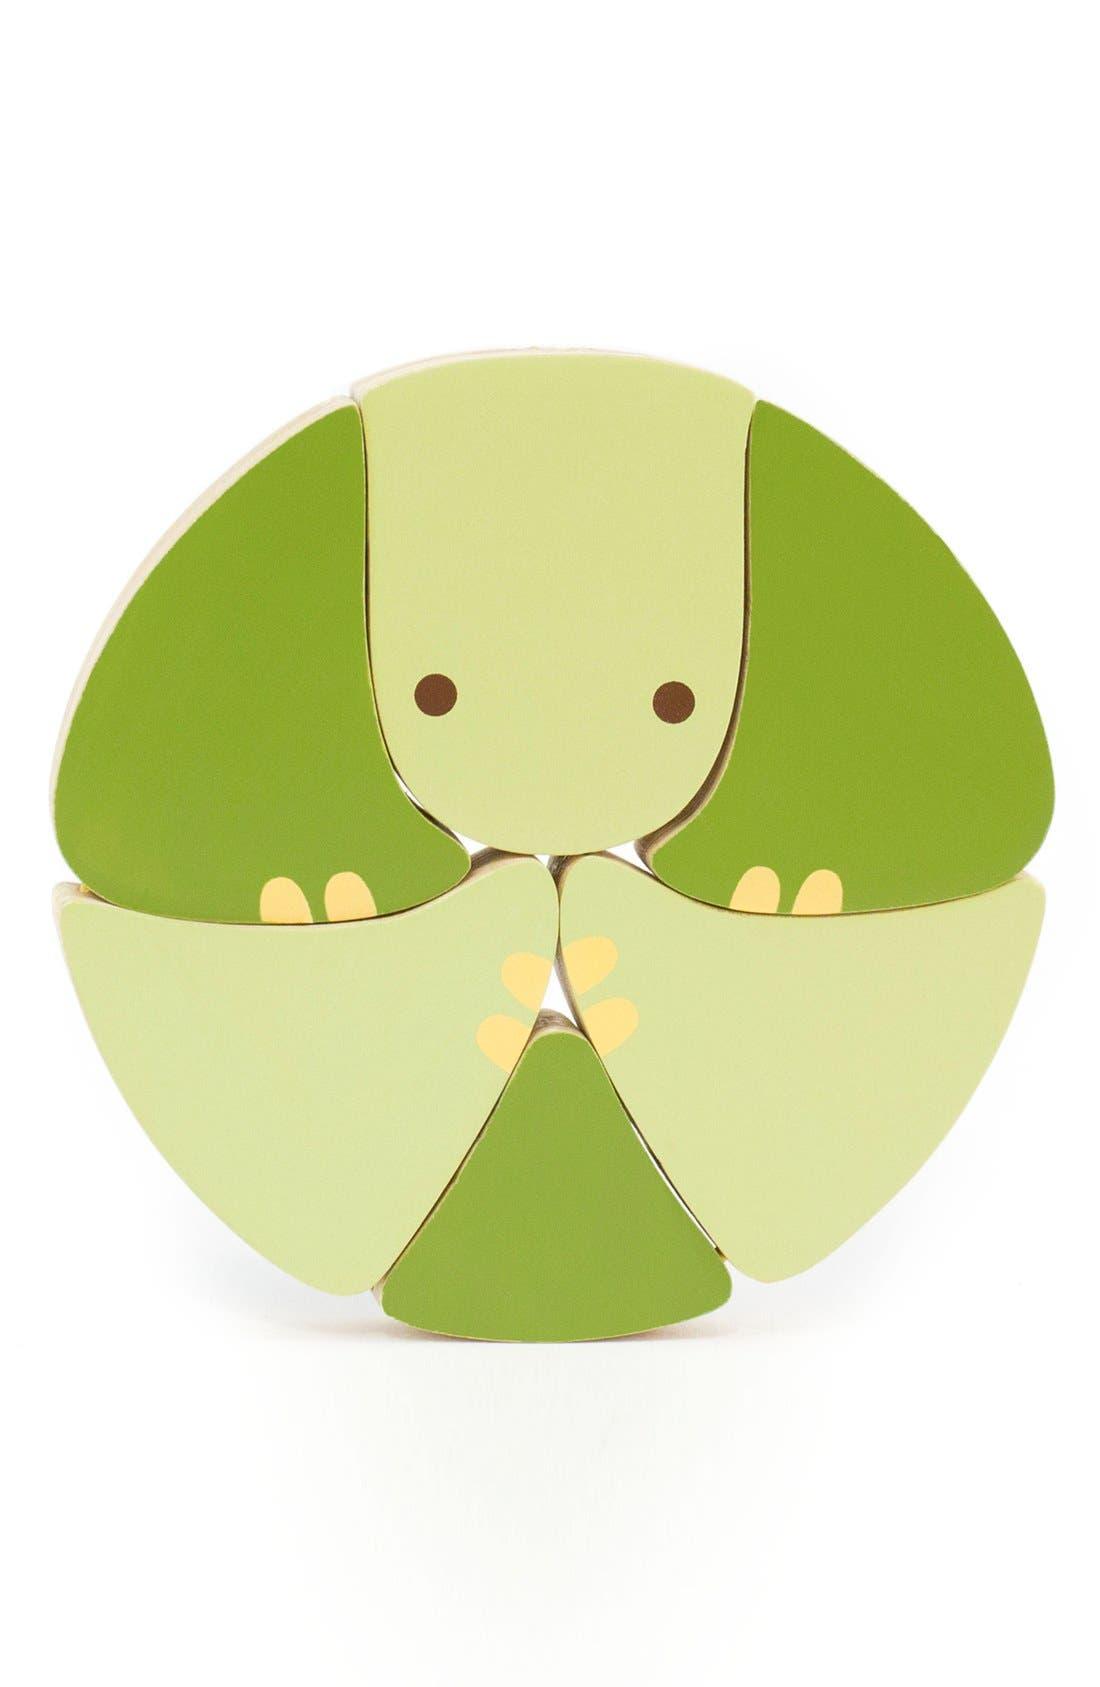 Alternate Image 1 Selected - Skip Hop 'Giraffe Safari - Flip & Play Turtle' Wooden Toy